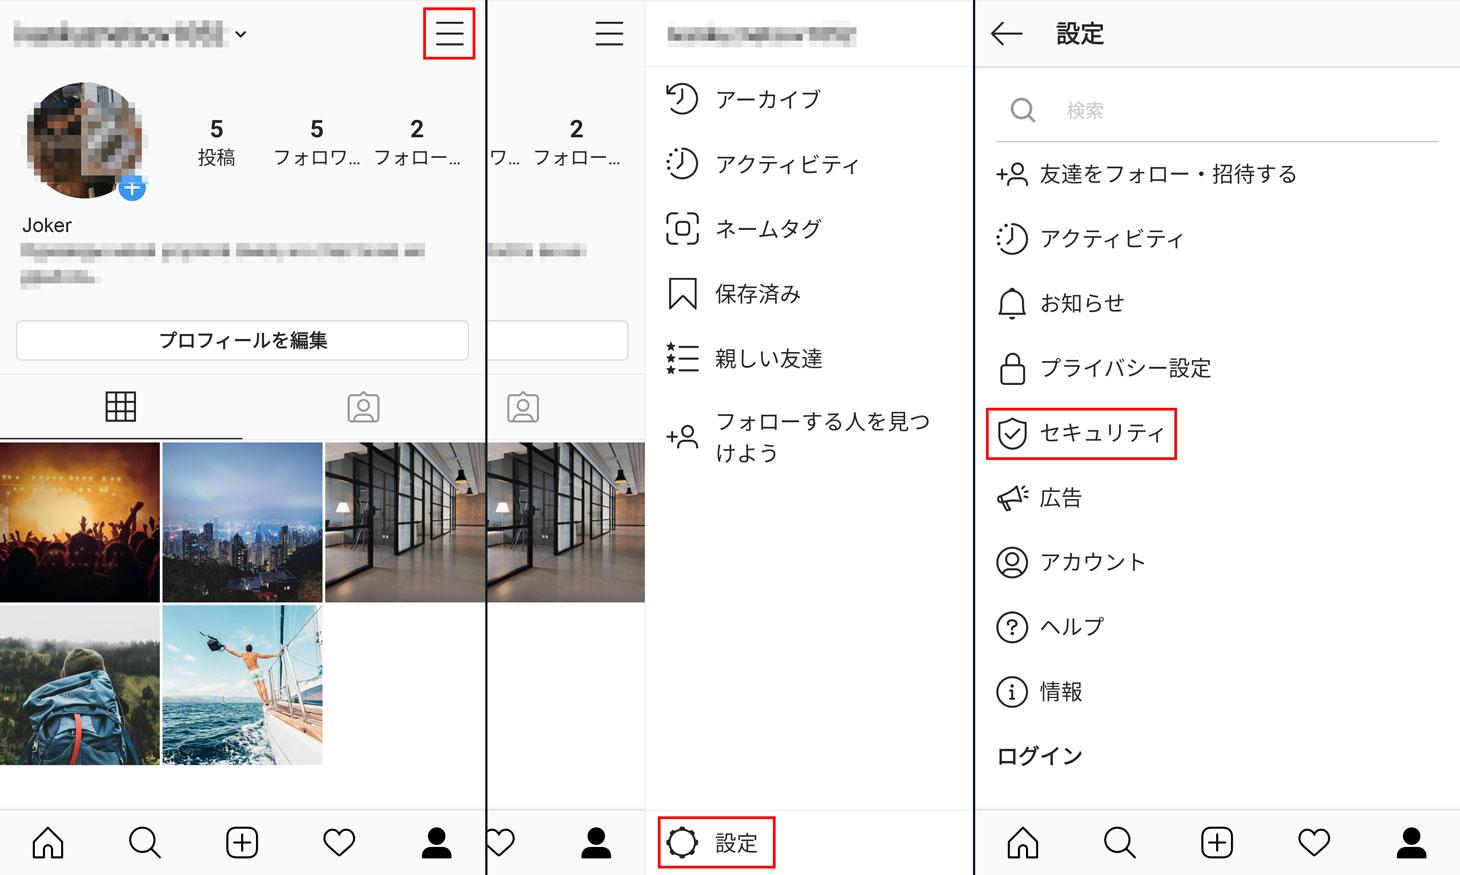 Instagramアプリのセキュリティ設定がある場所